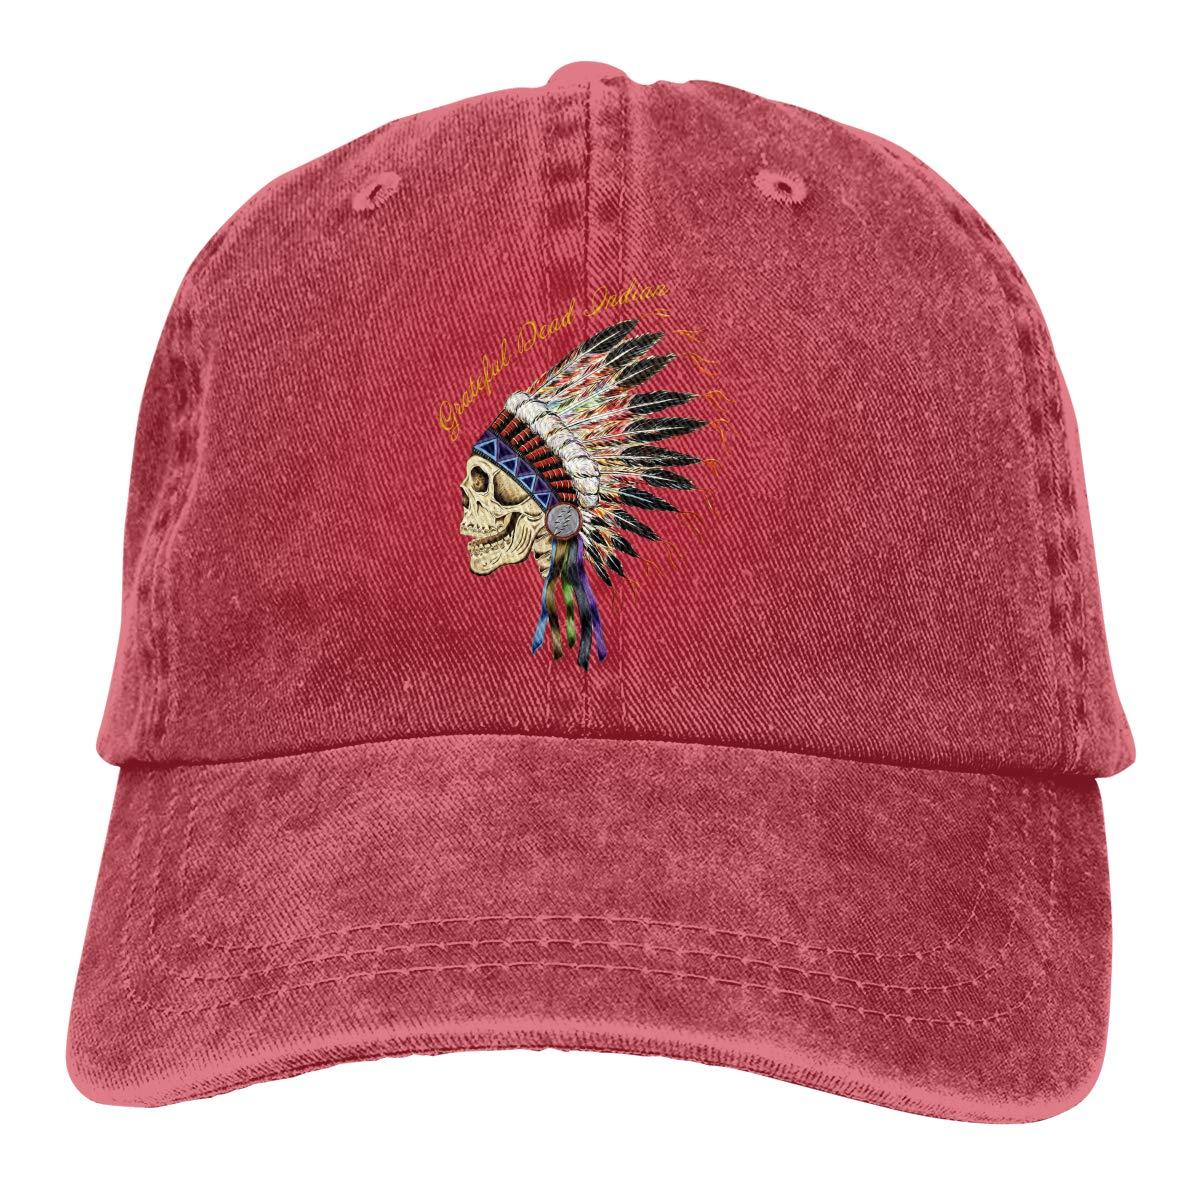 68db5e23494c9 Amerltees Grateful Dead Indian Unisex Vintage Washed Distressed Baseball-Cap  Twill Adjustable Dad-Hat Black at Amazon Men s Clothing store